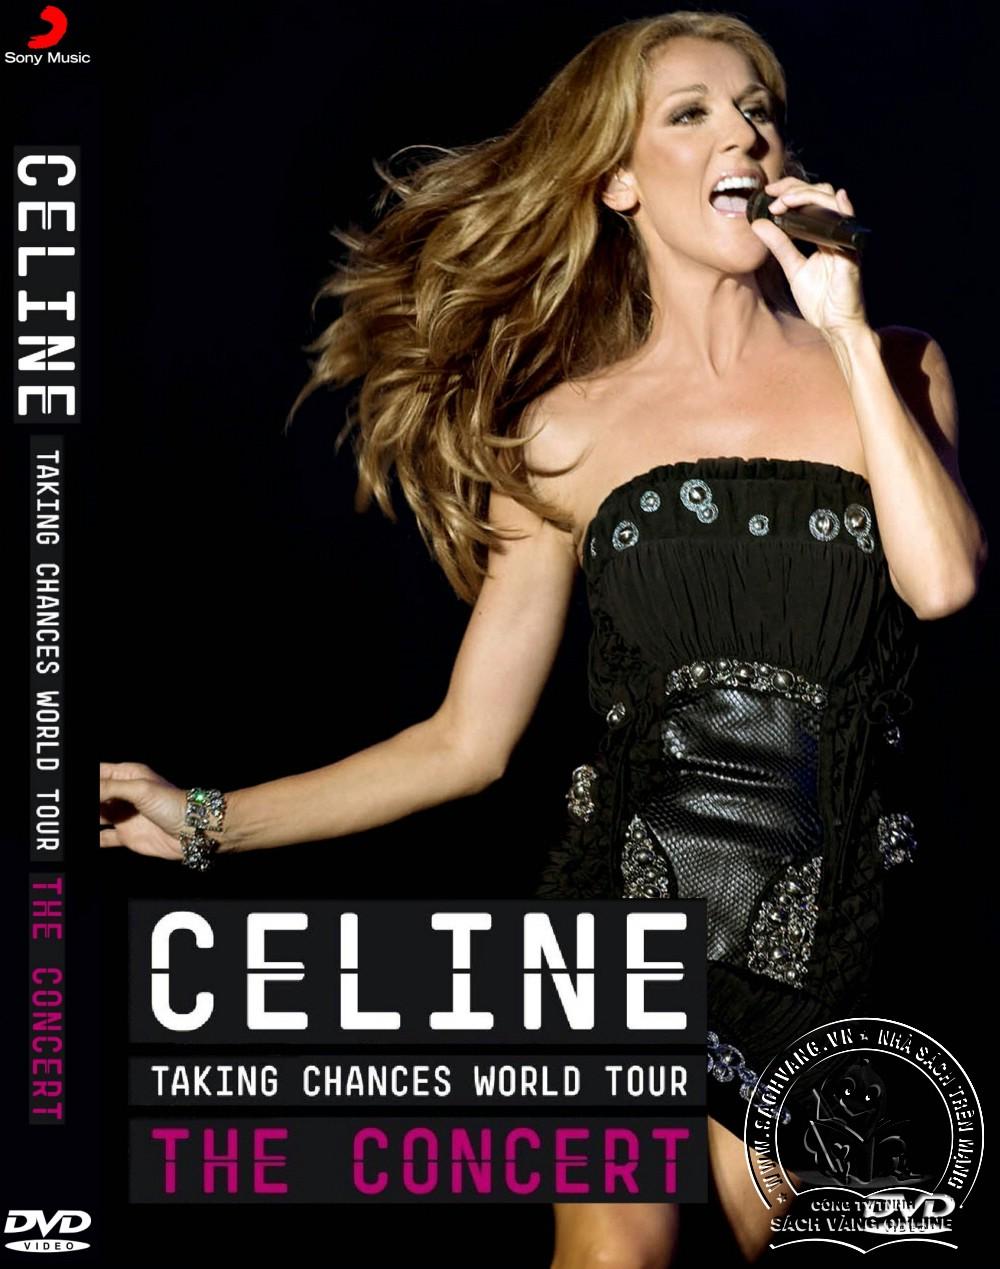 Celine Dion Taking Chances World Tour The Concert  Download